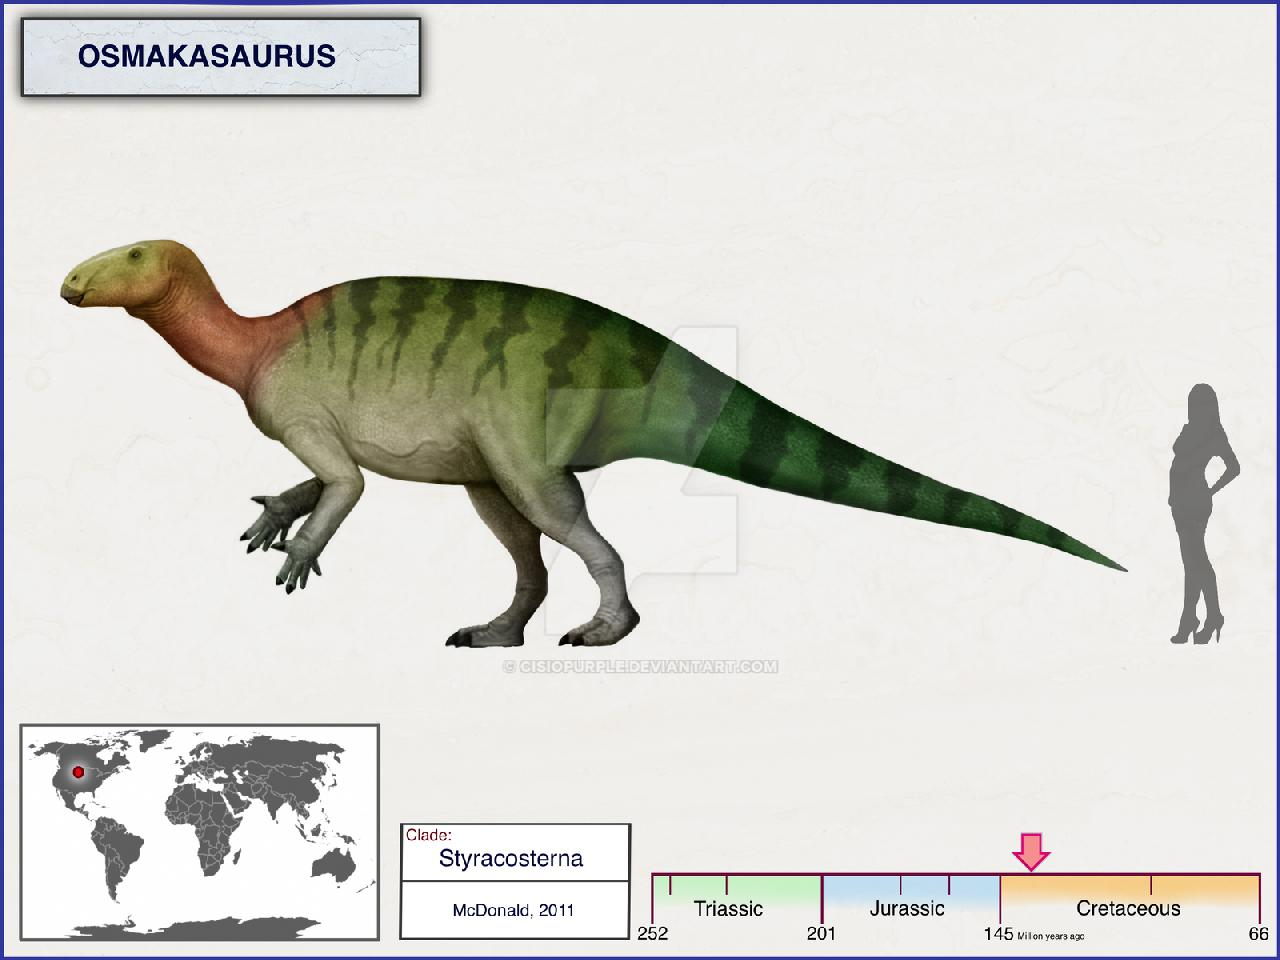 Osmakasaurus